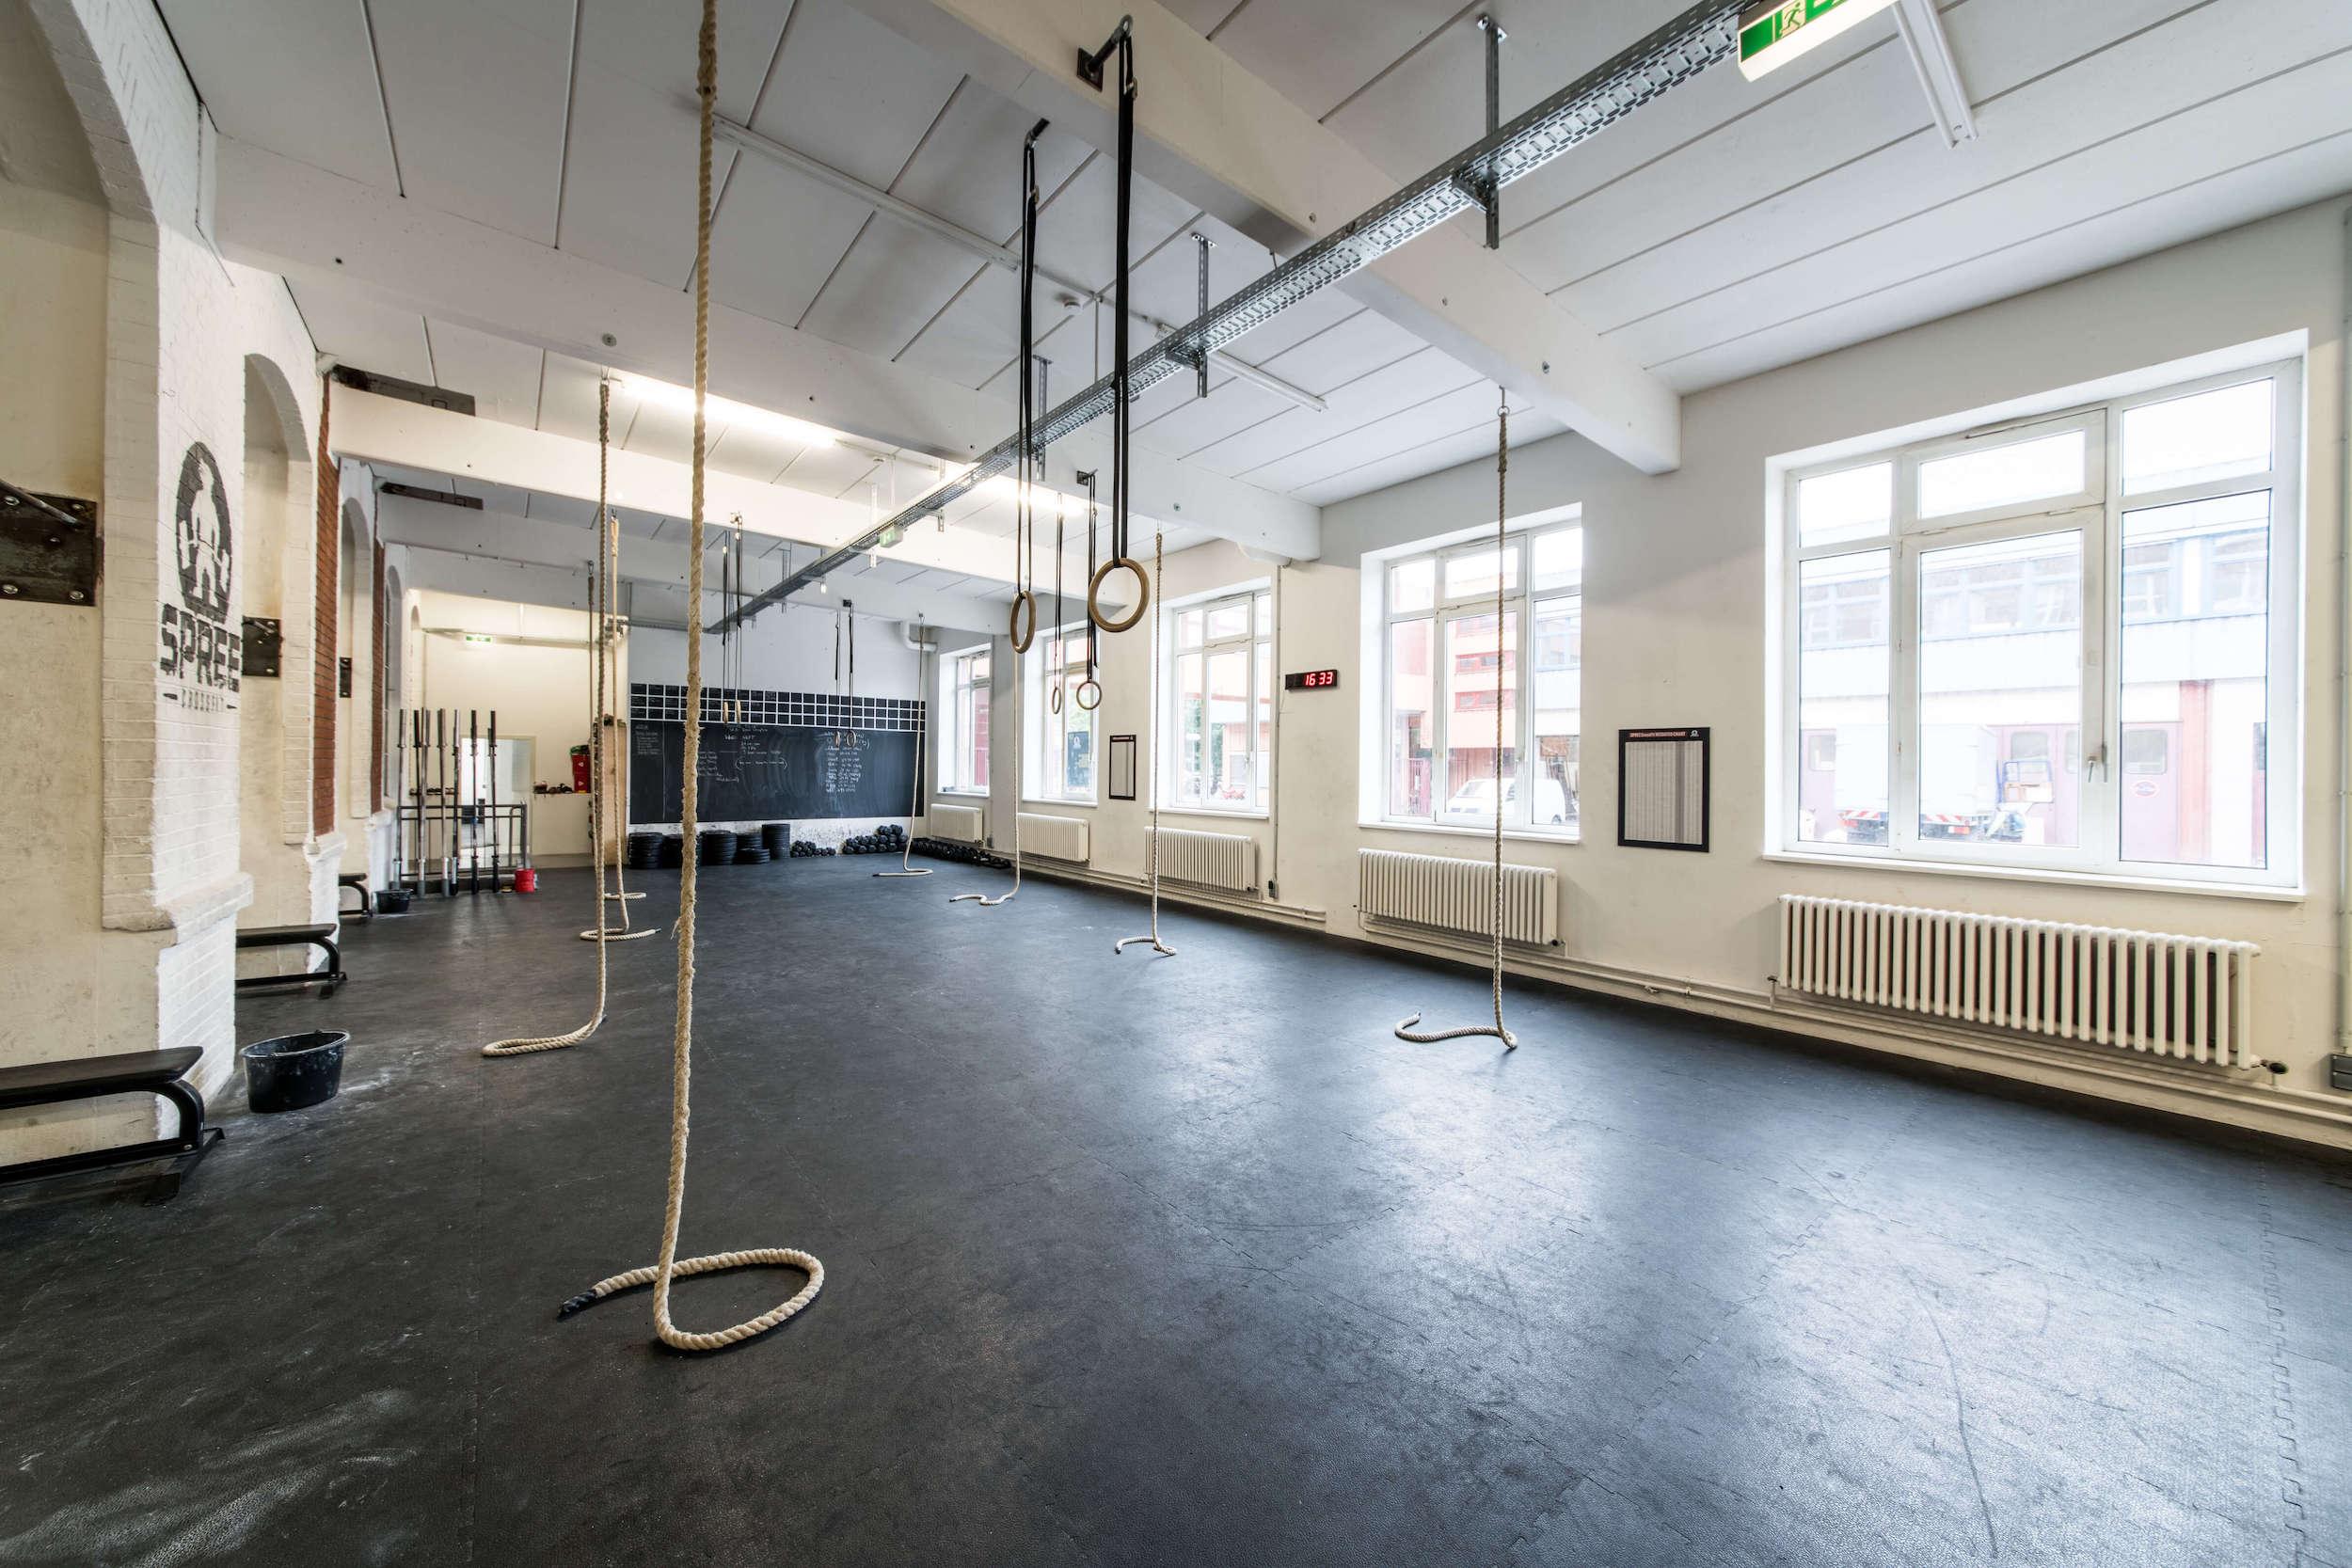 Spree CrossFit Box big Hall